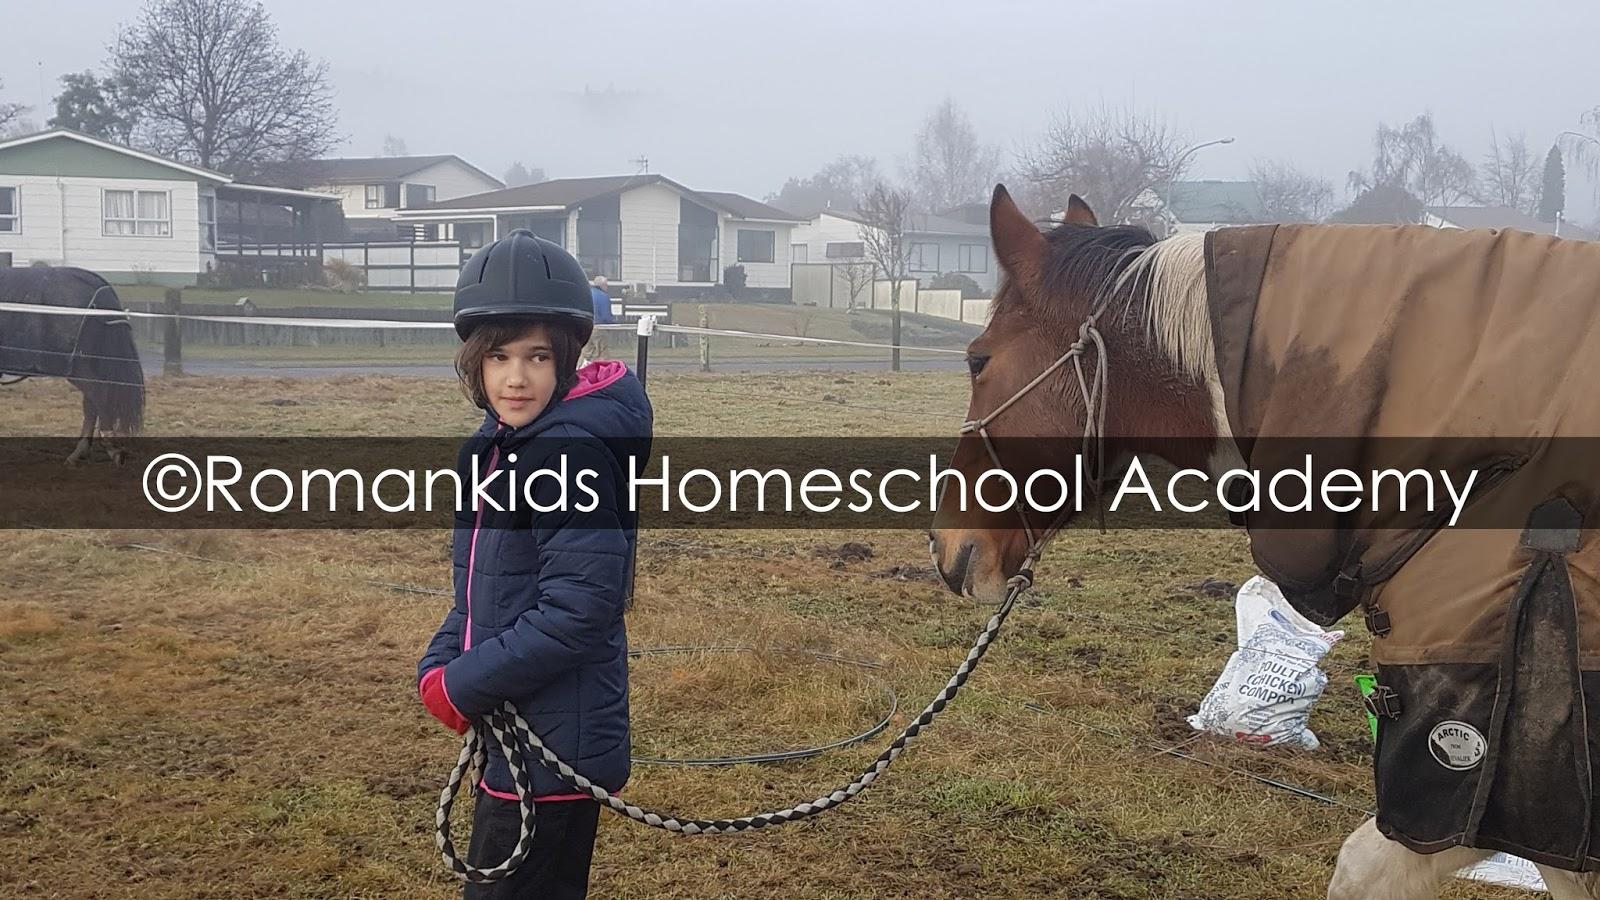 Romankids homeschool academy week 9 term 2 2017 for Where to go horseback riding near me